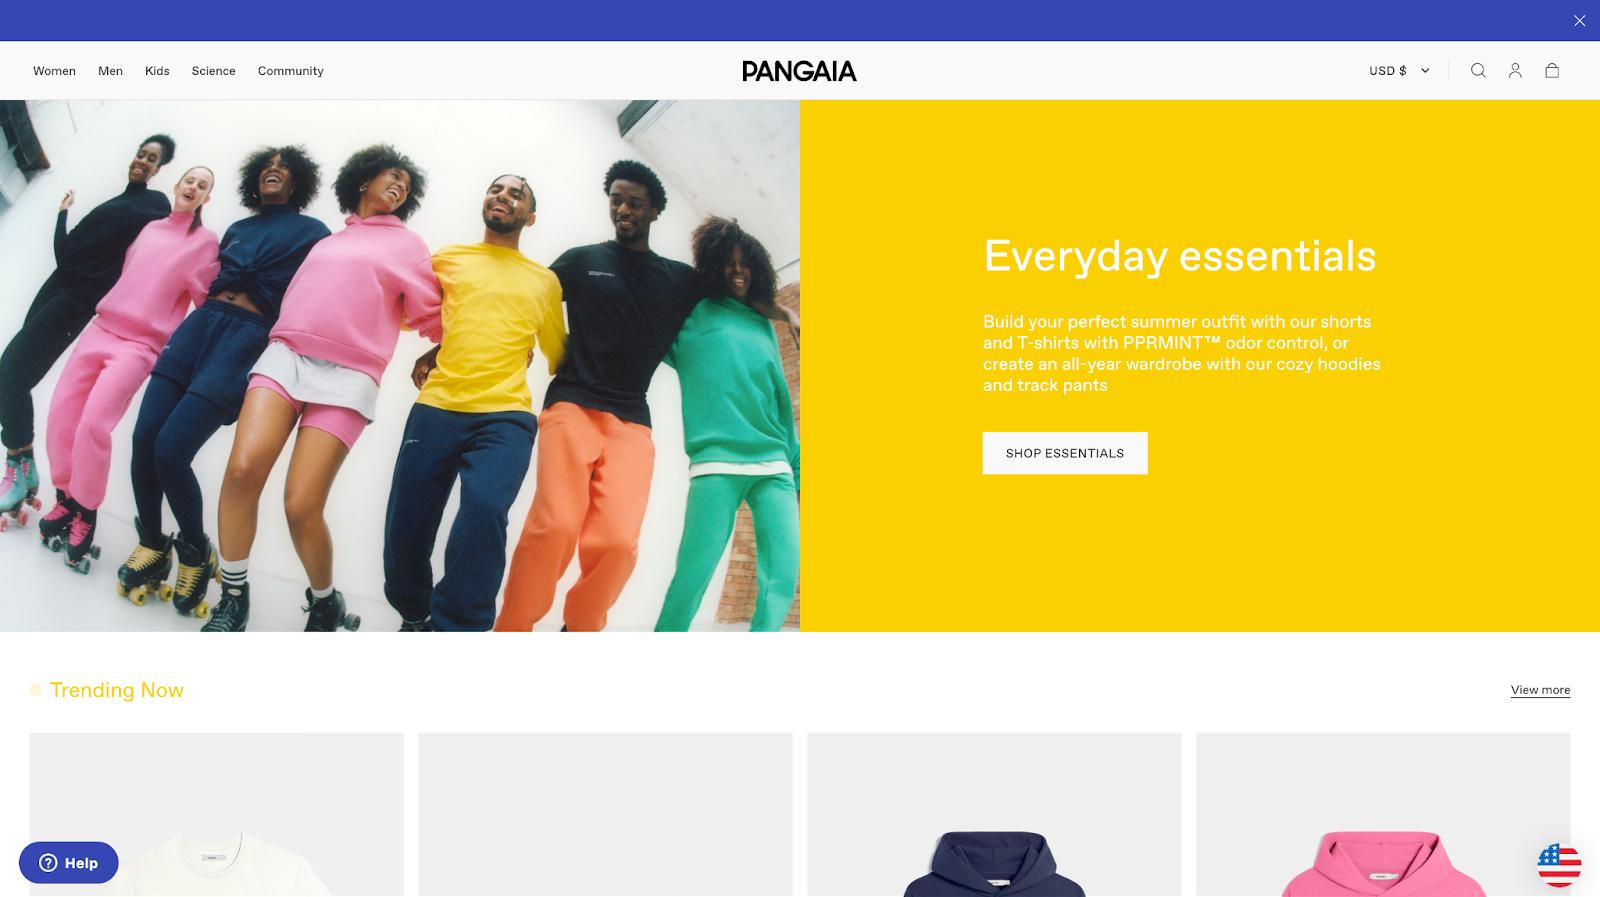 pangaia sustainable loungewear shogun built homepage